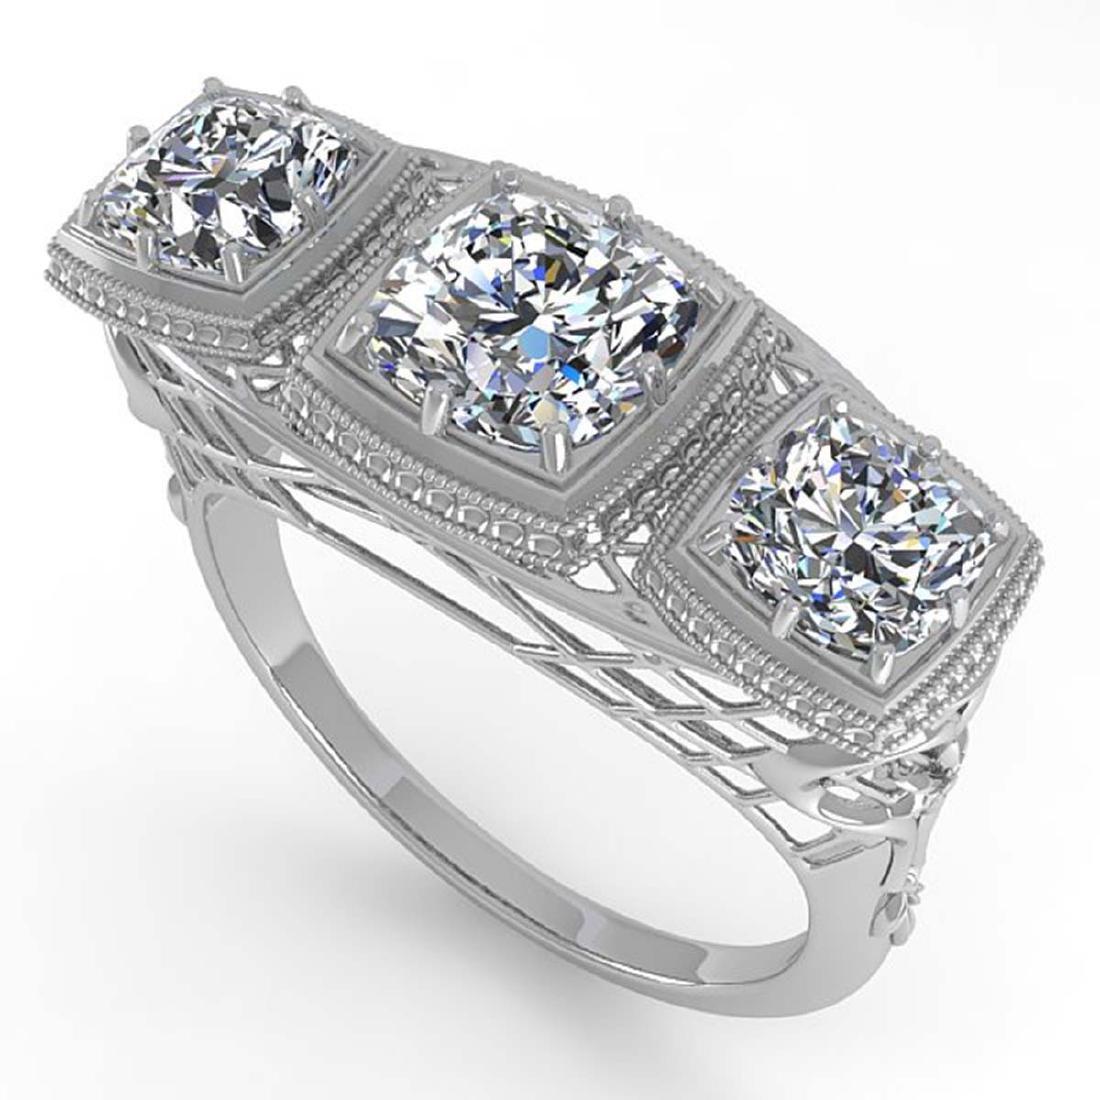 2 CTW VS/SI Cushion Cut Diamond Ring Art Deco 14K White - 2